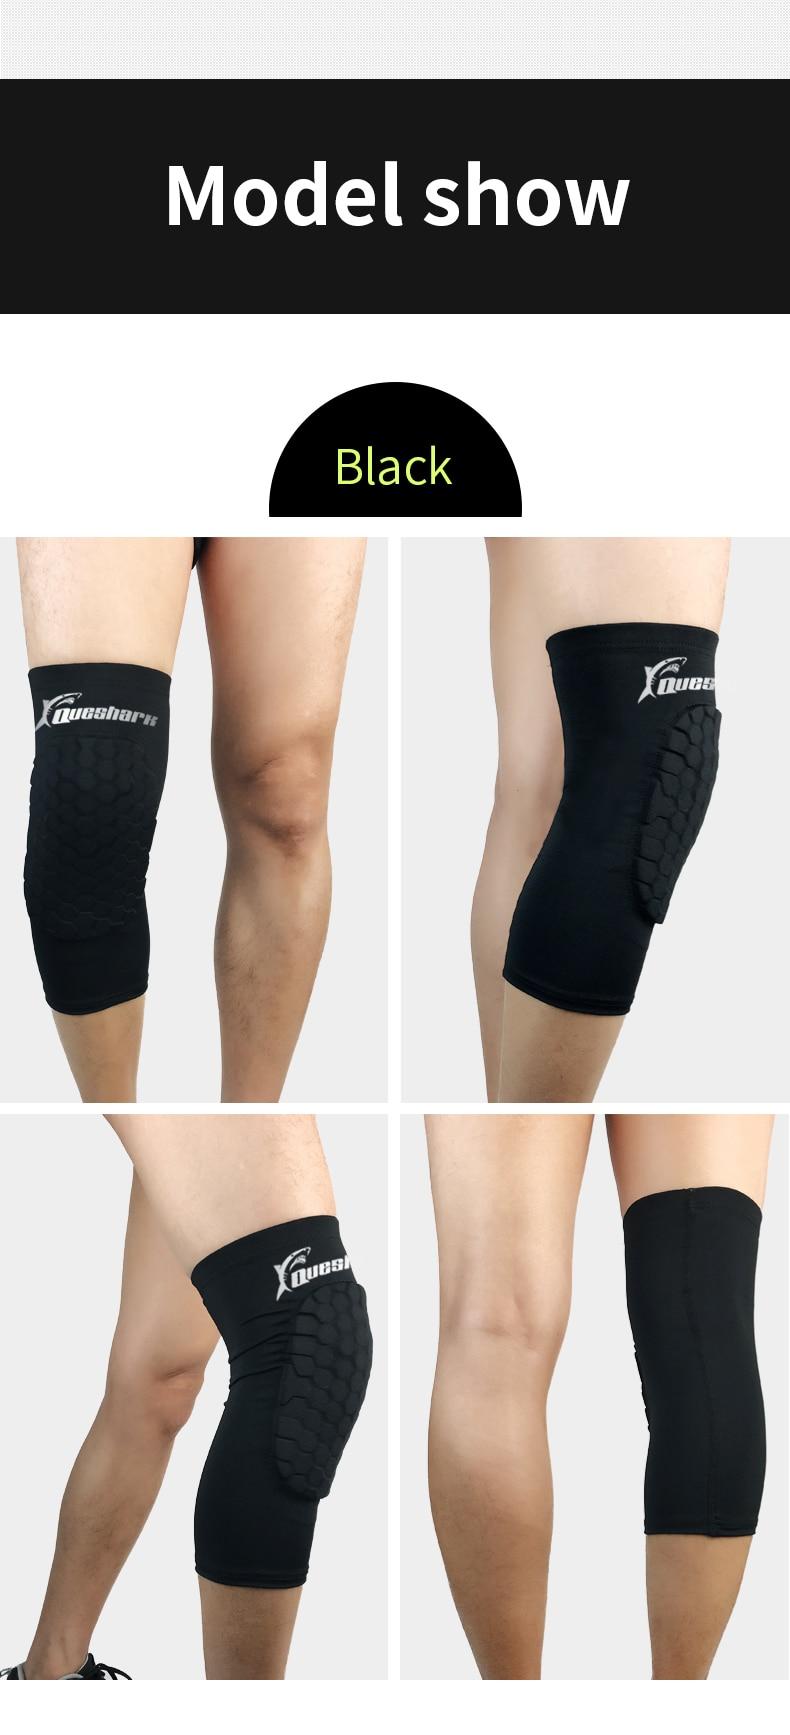 2pcs Honeycomb Basketball Knee Pads Running Brace Calf Leg Sleeve Kneepad Hx003 1 13